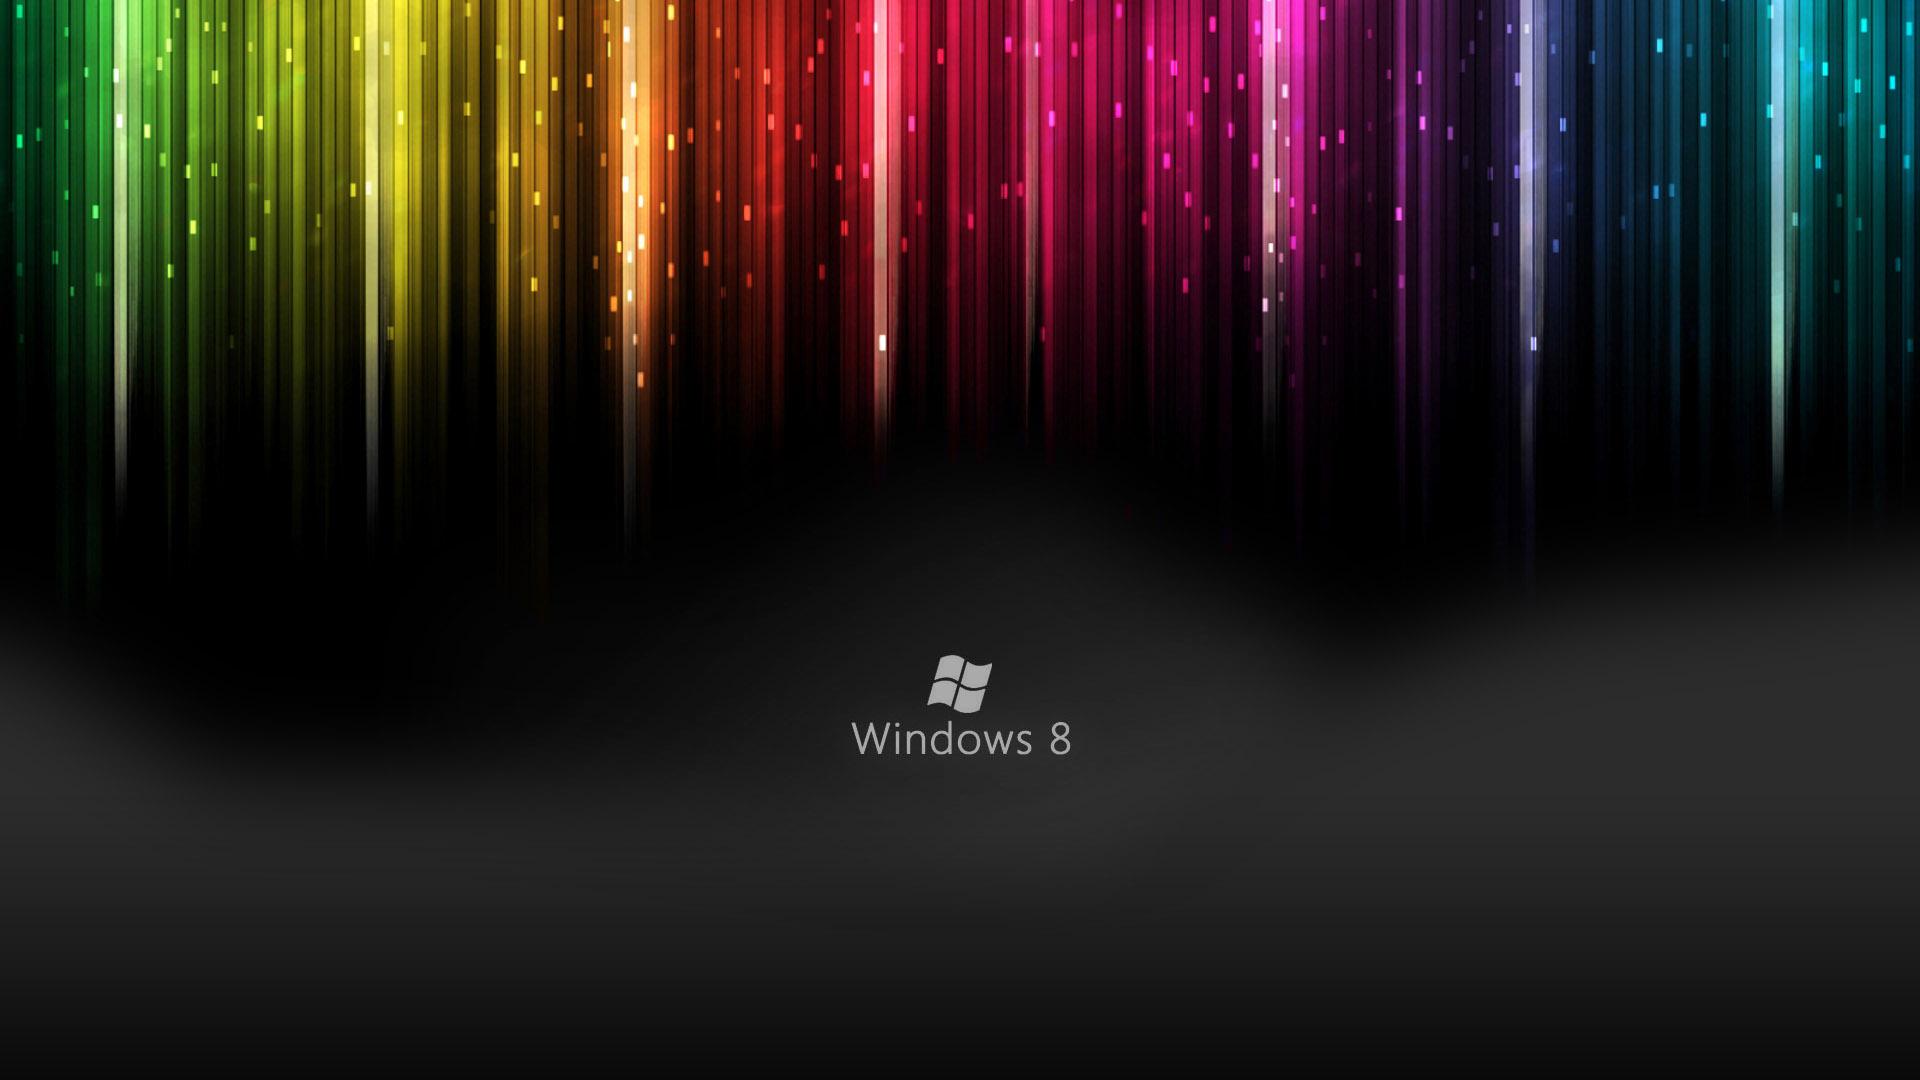 Windows 8 Live Wallpapers HD Wallpaperjpg 1920x1080